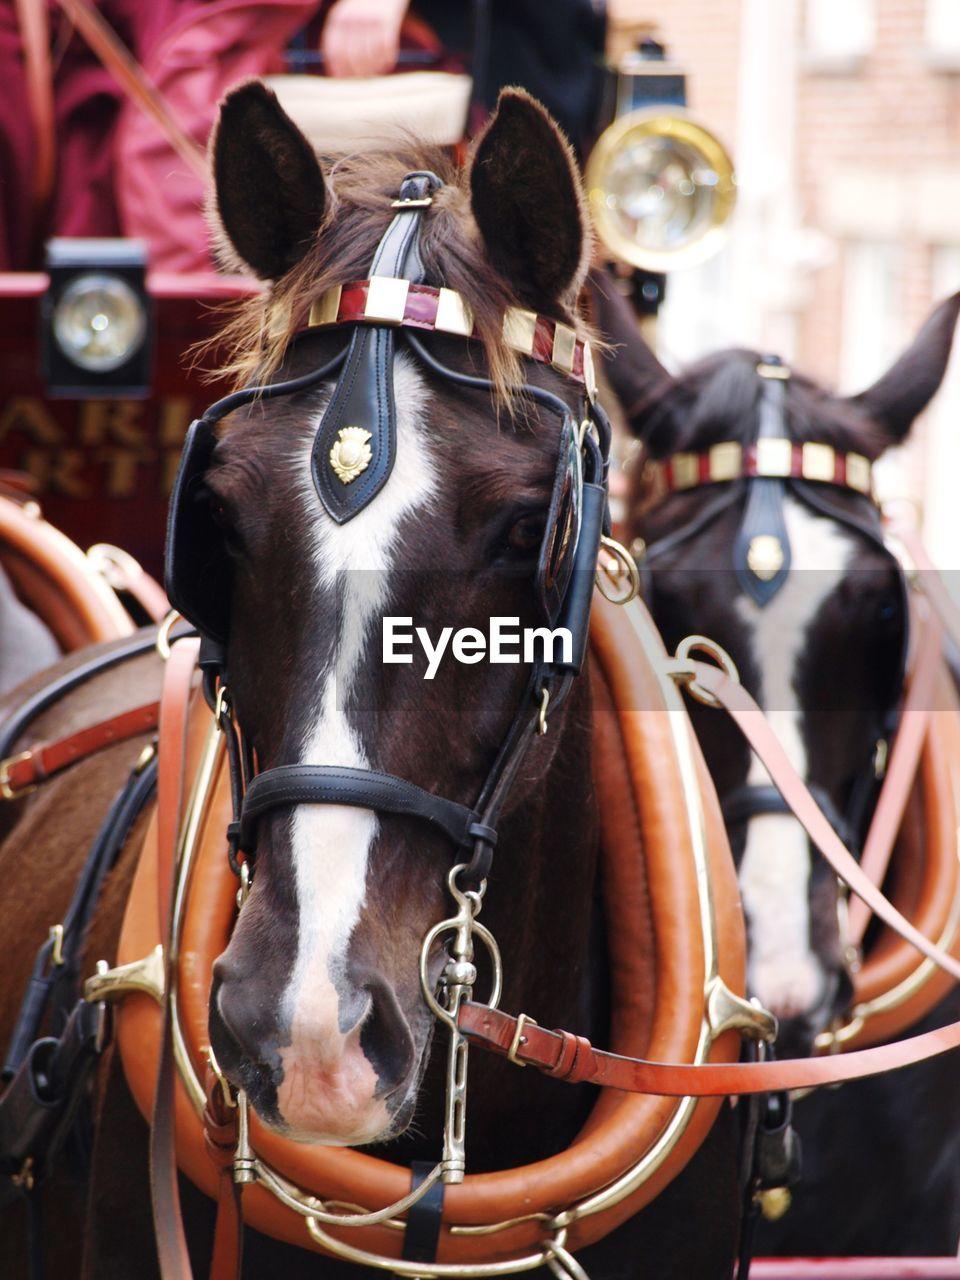 horse, domestic animals, livestock, domestic, animal wildlife, mammal, animal, animal themes, bridle, focus on foreground, vertebrate, pets, horse cart, working animal, day, street, cart, close-up, horsedrawn, city, herbivorous